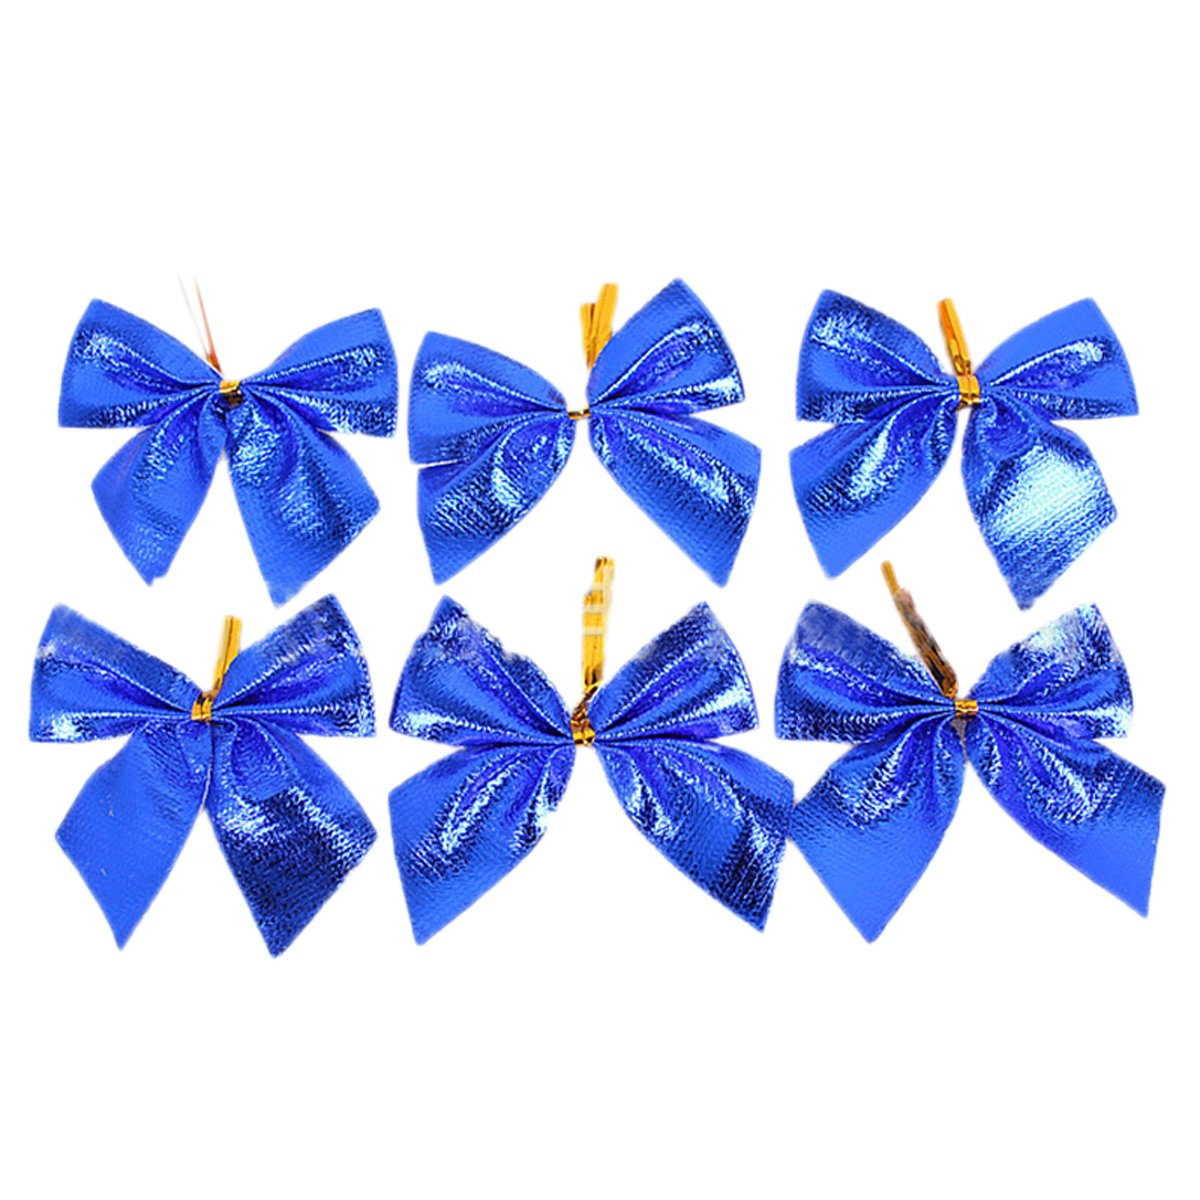 Edtoy 12pcs Christmas Tree Bow Decoration Baubles Merry XMAS Party Garden Bows Decor Ornament Blue